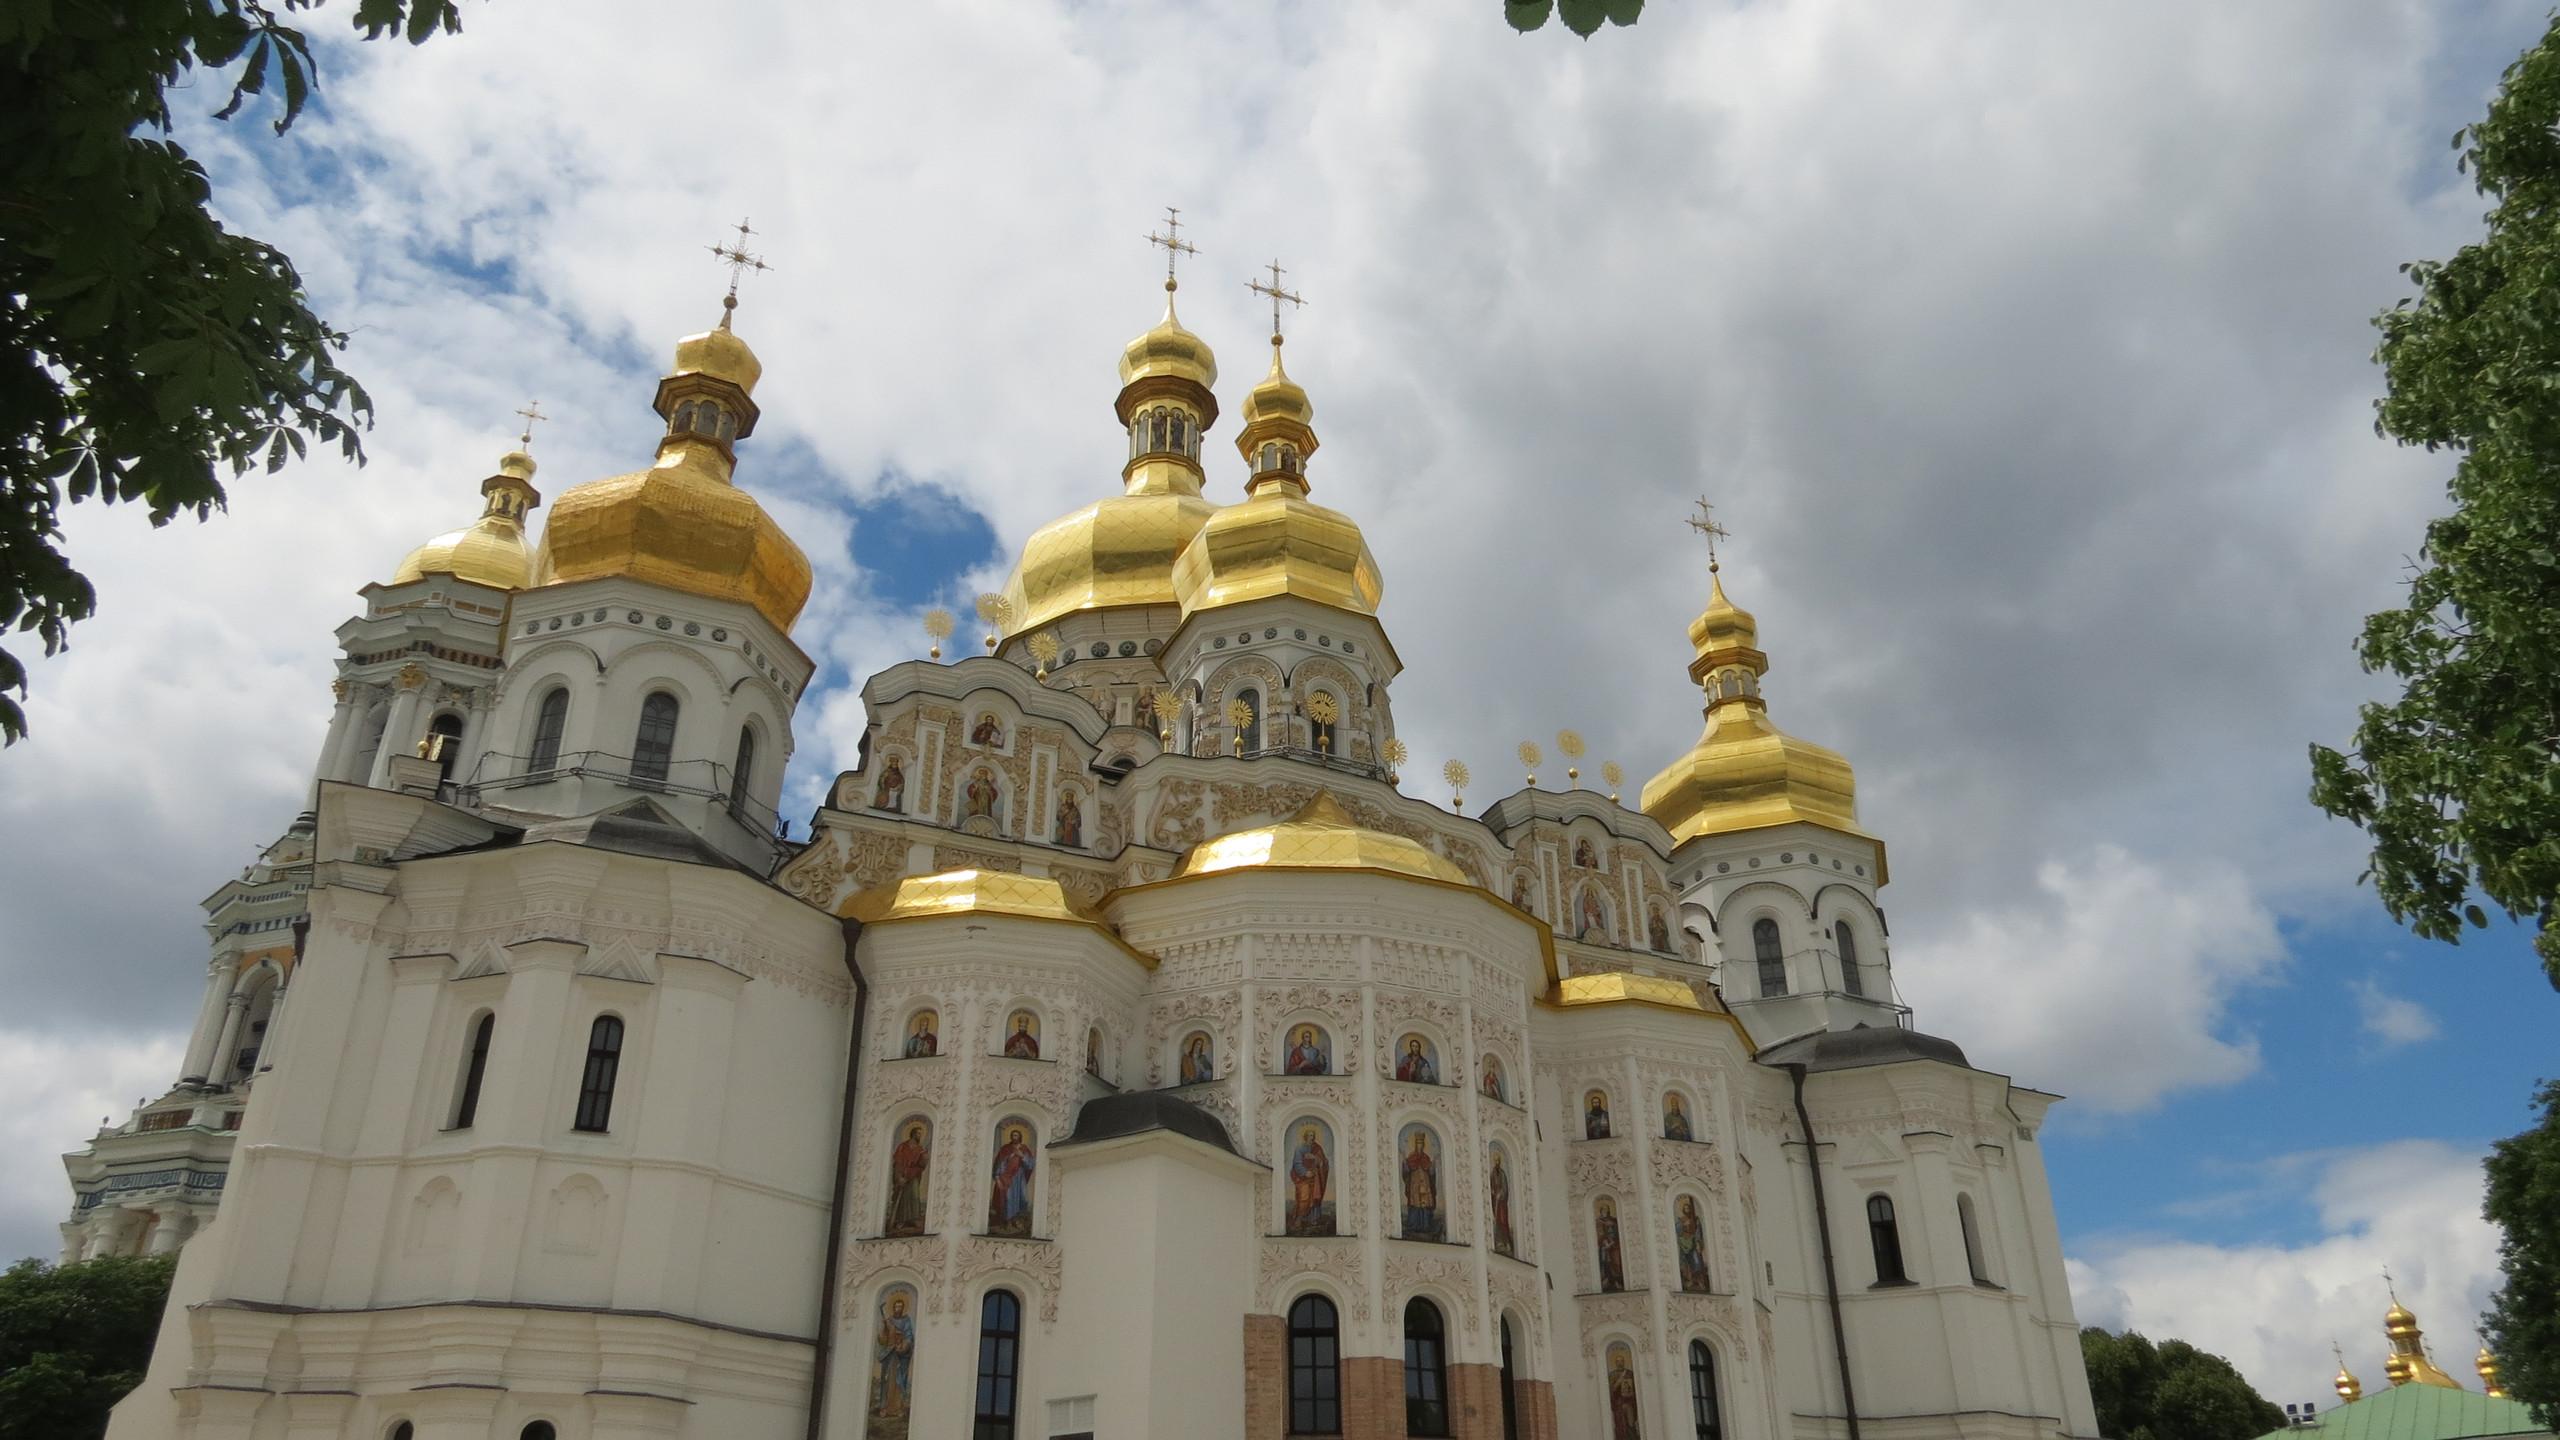 341 - Lavra, Kyiv